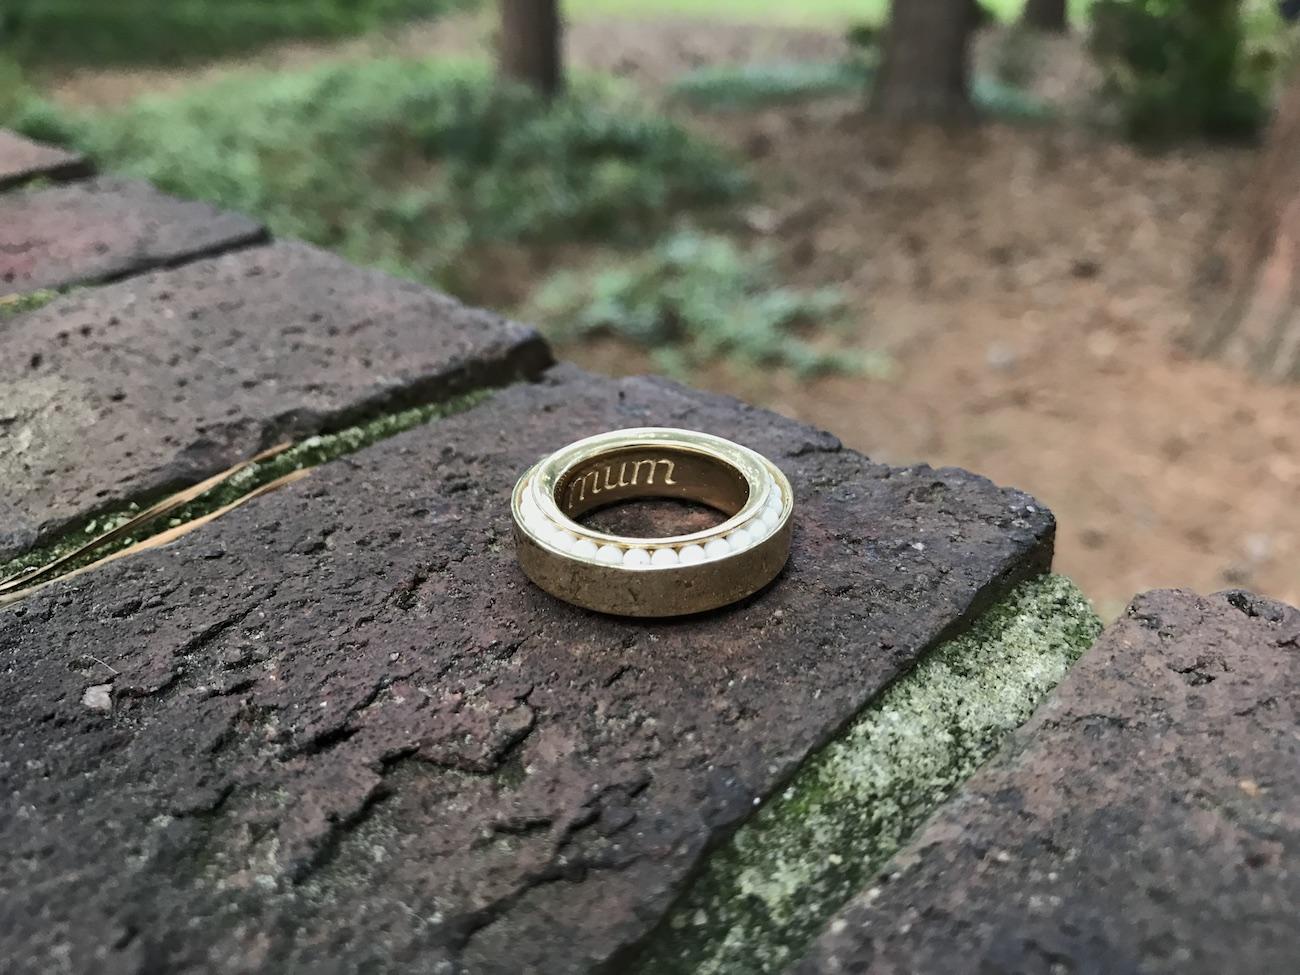 Vinci Ring Discreet and Elegant Fidget Spinner